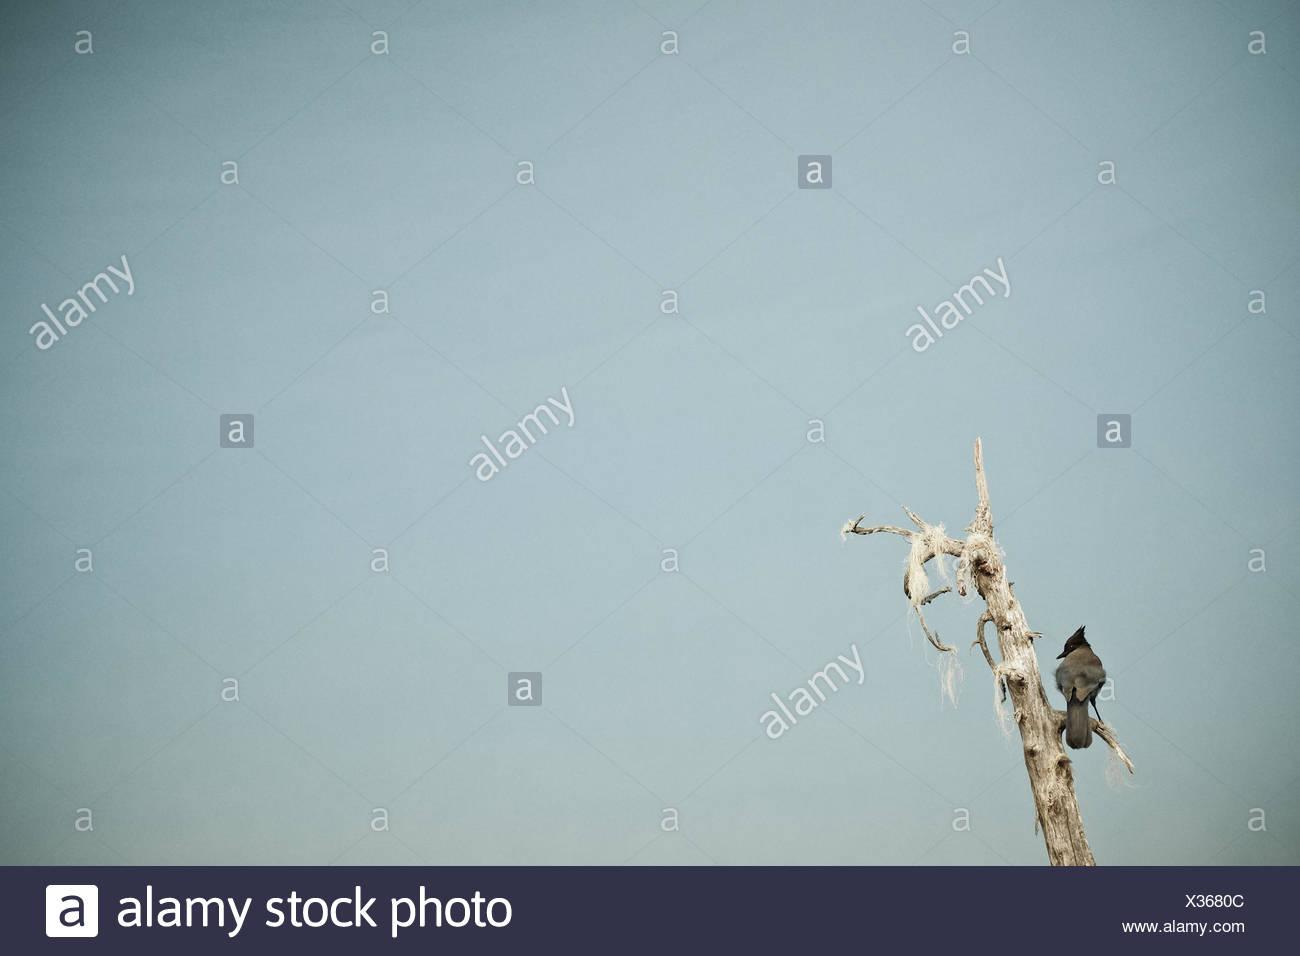 Bird on tree branch - Stock Image